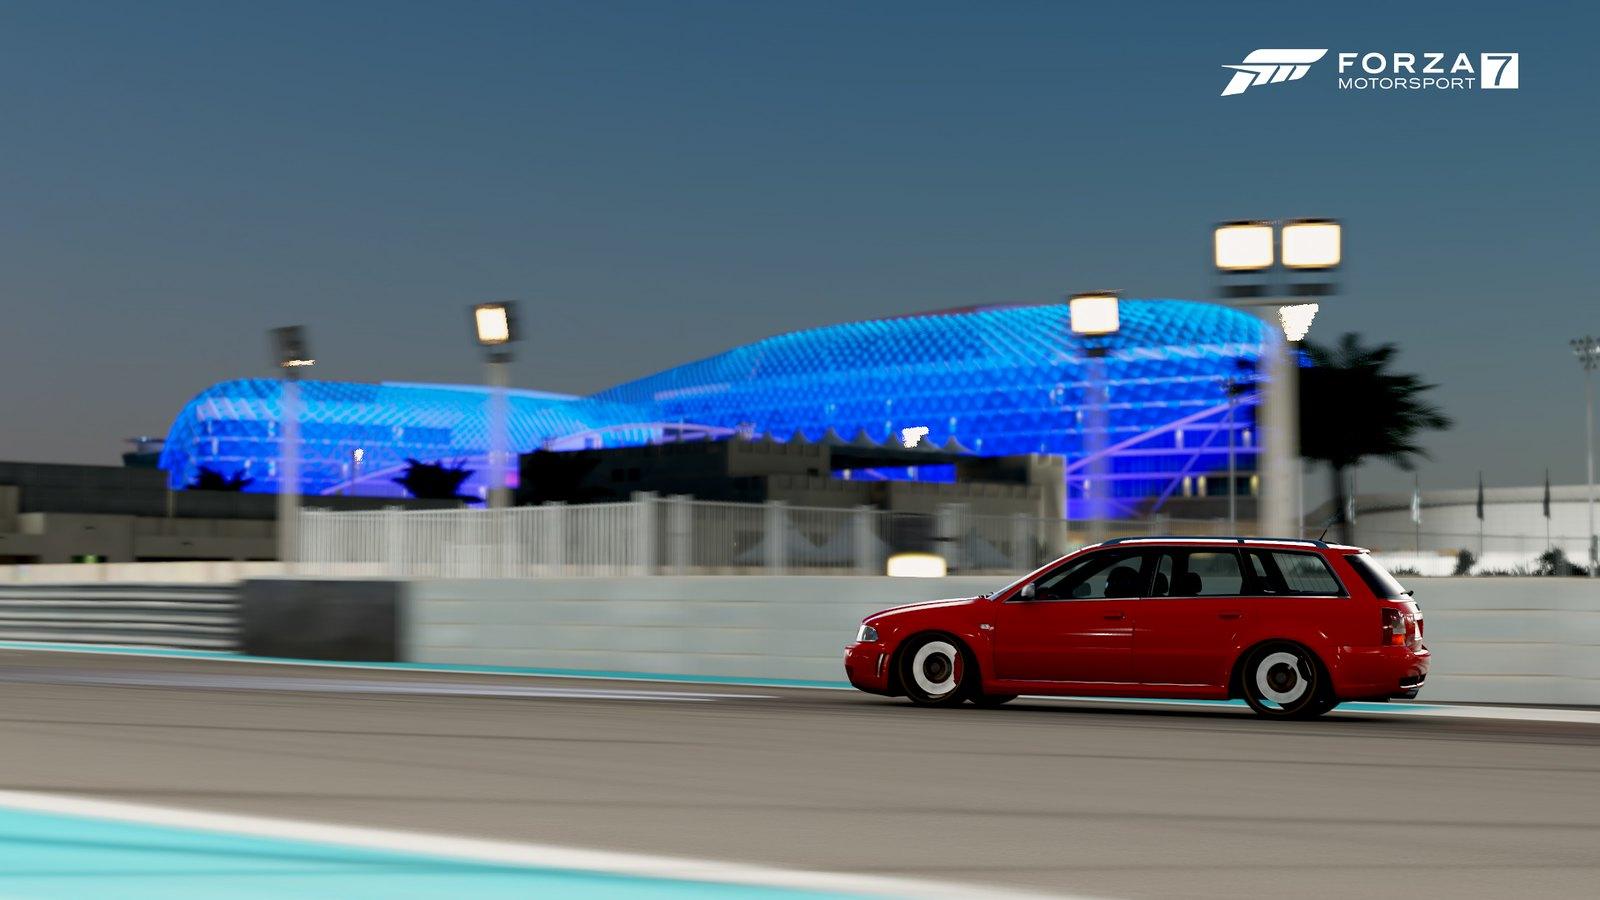 39866120194_5de7254467_h ForzaMotorsport.fr